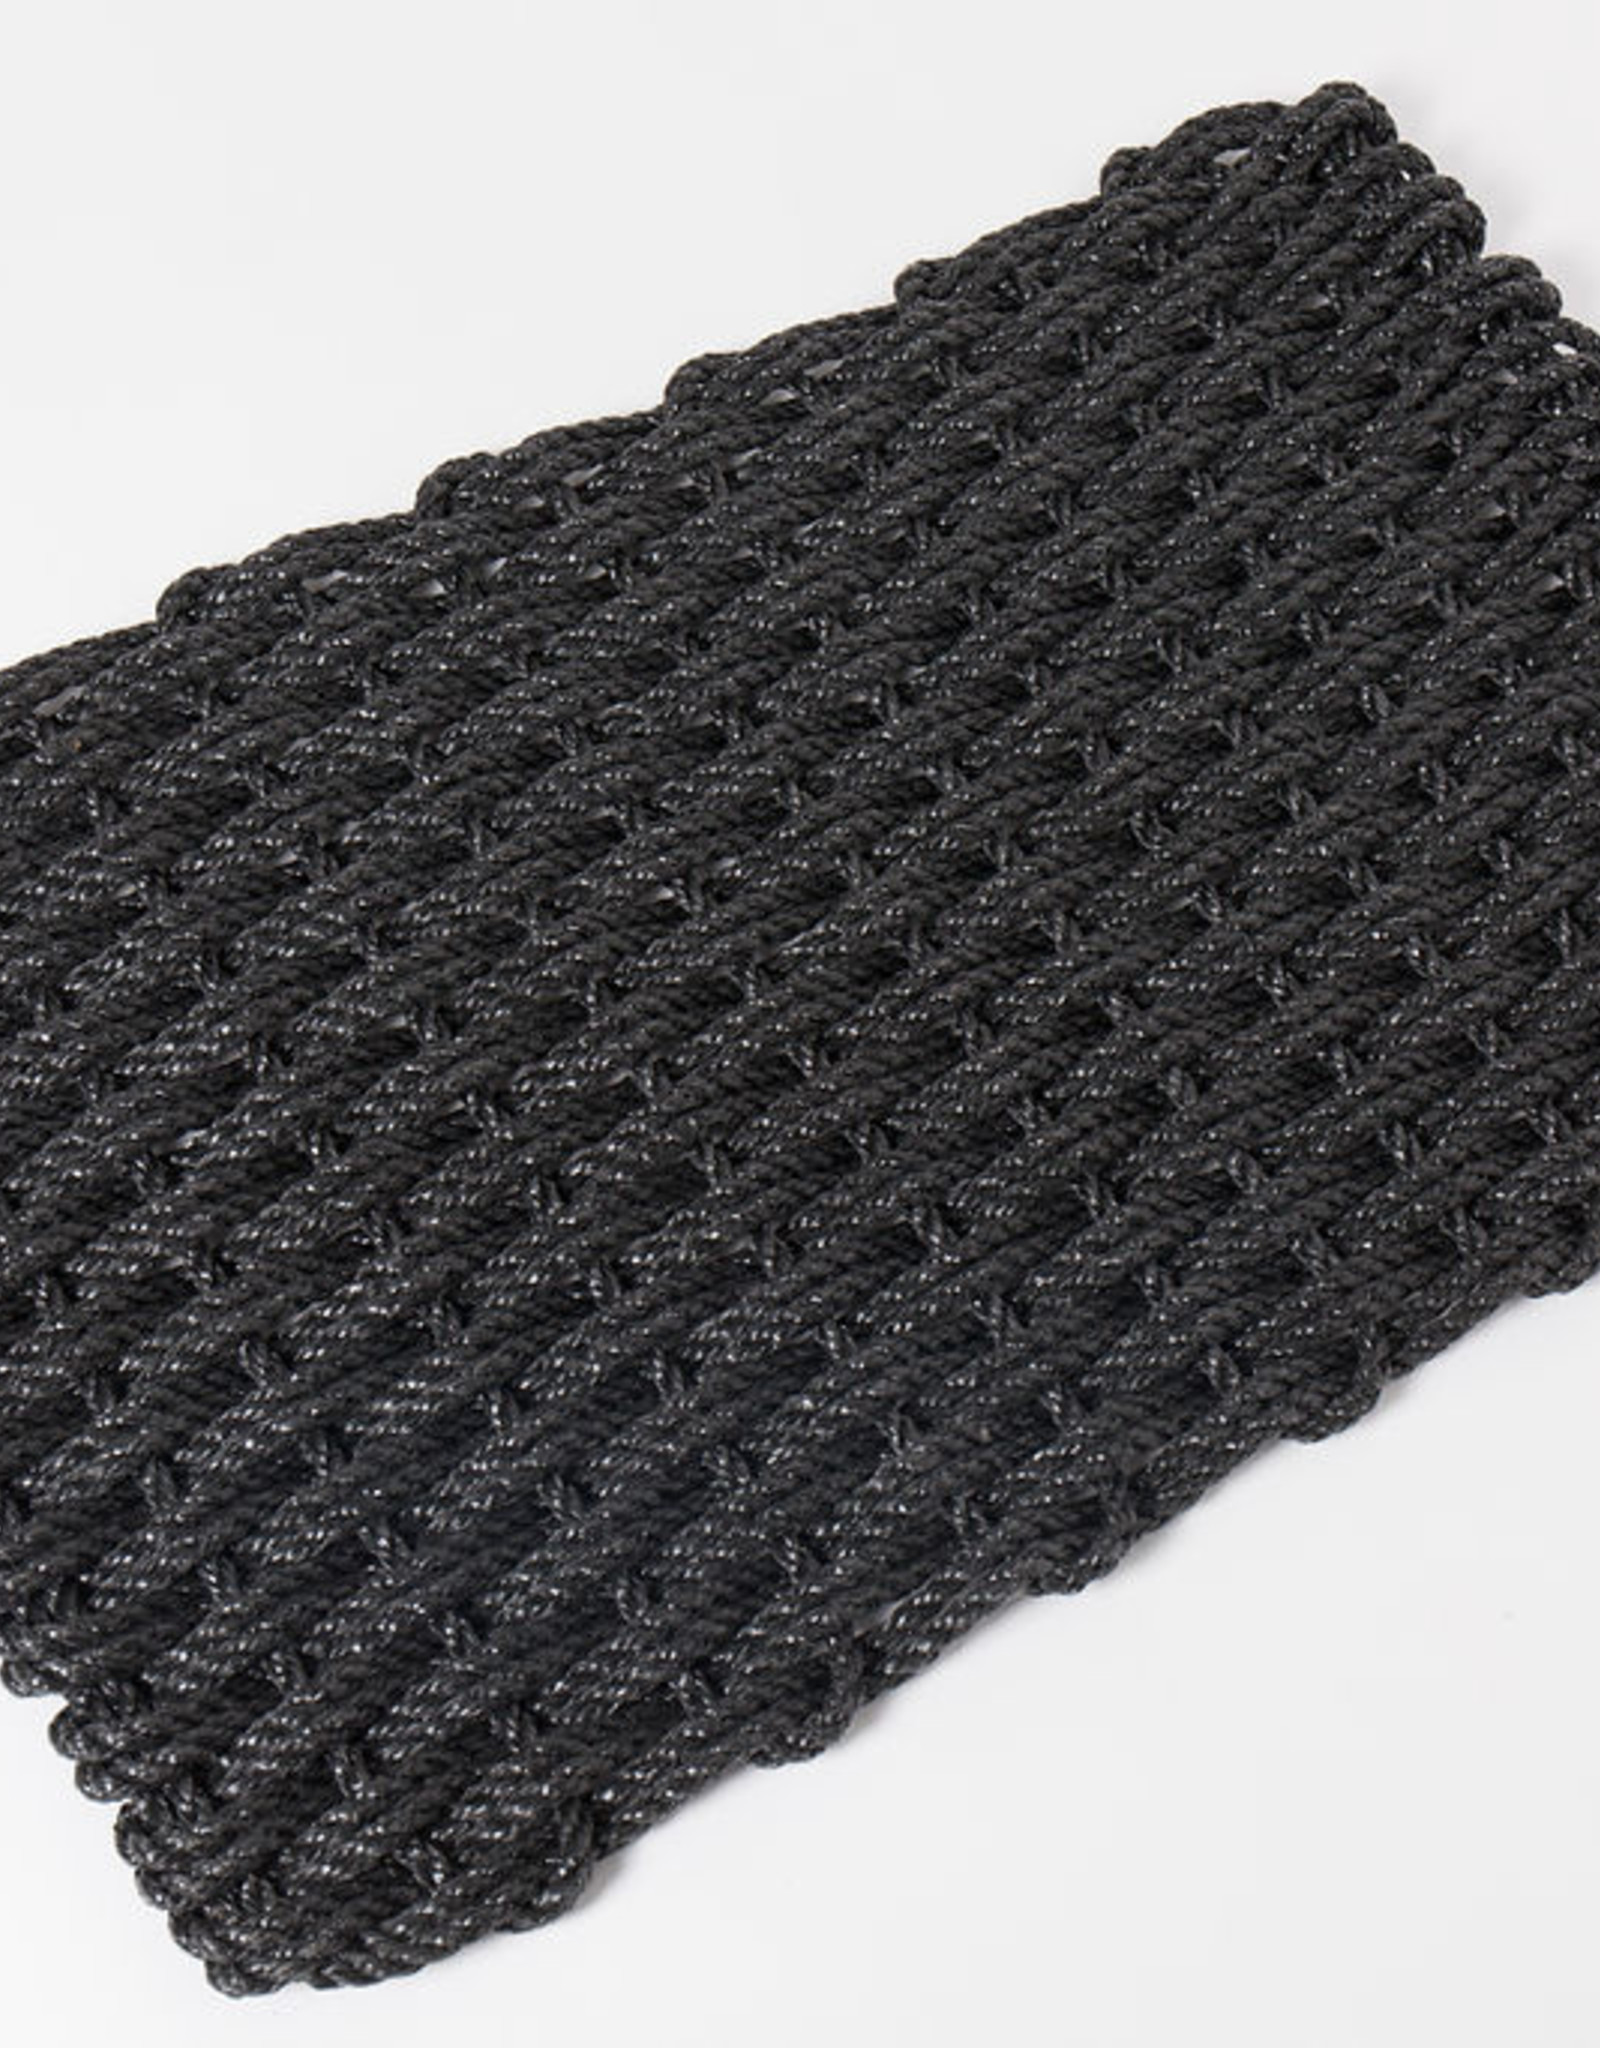 Large Charcoal Doormat